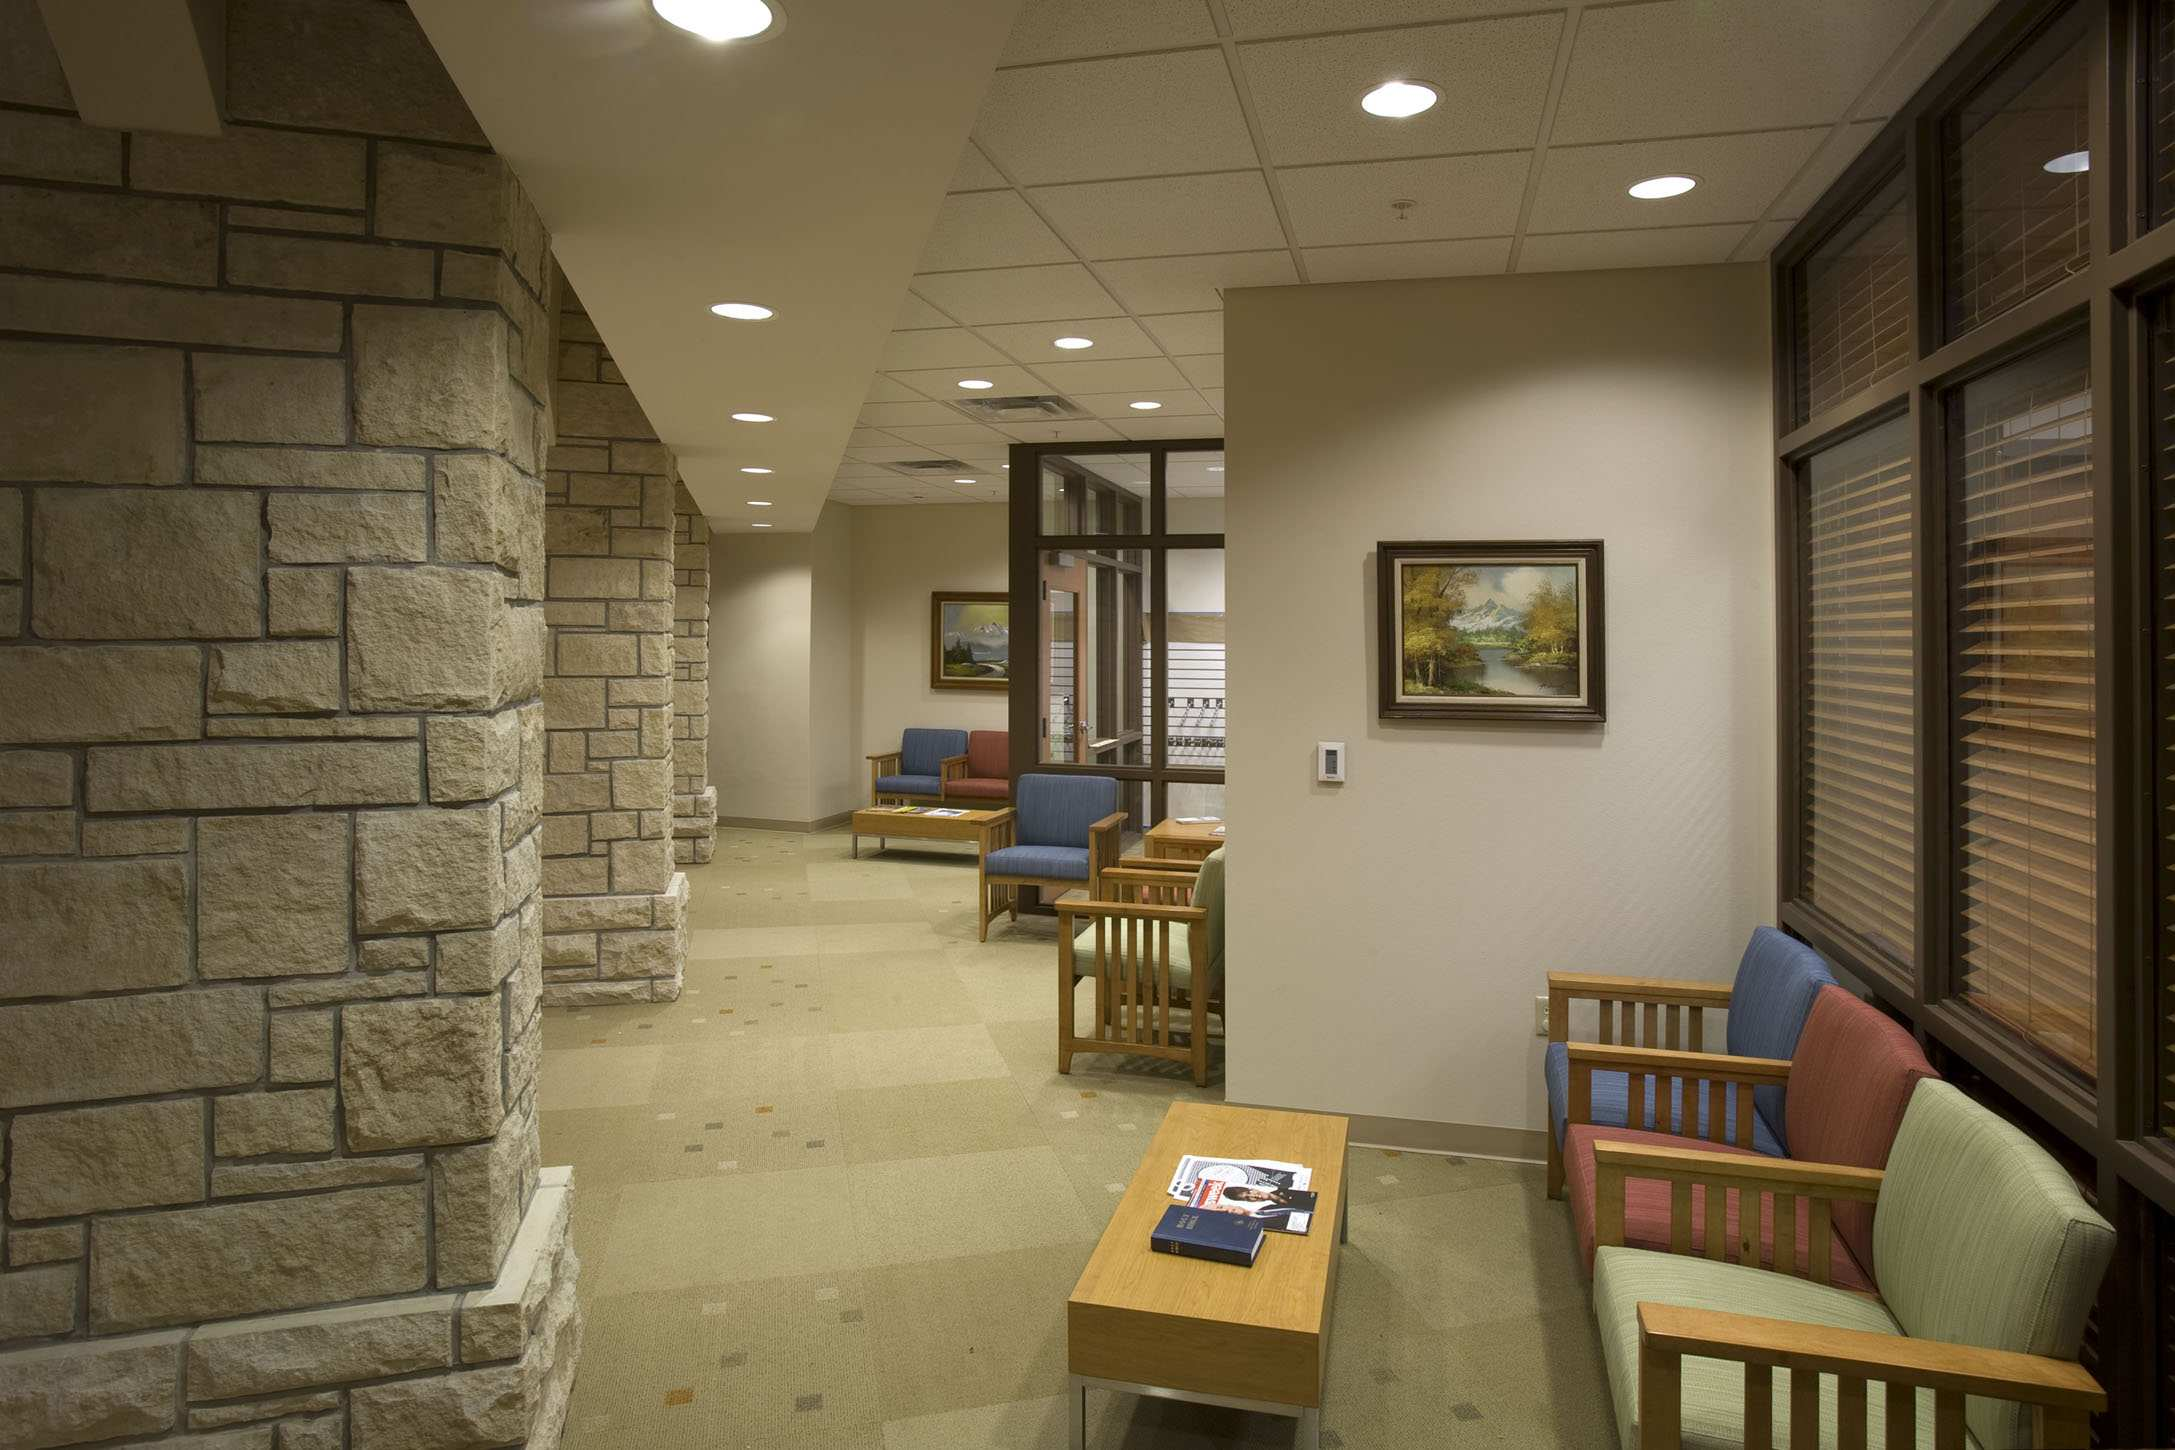 rooks county health center plainville kansas breastfeeding breastpumping friendly place